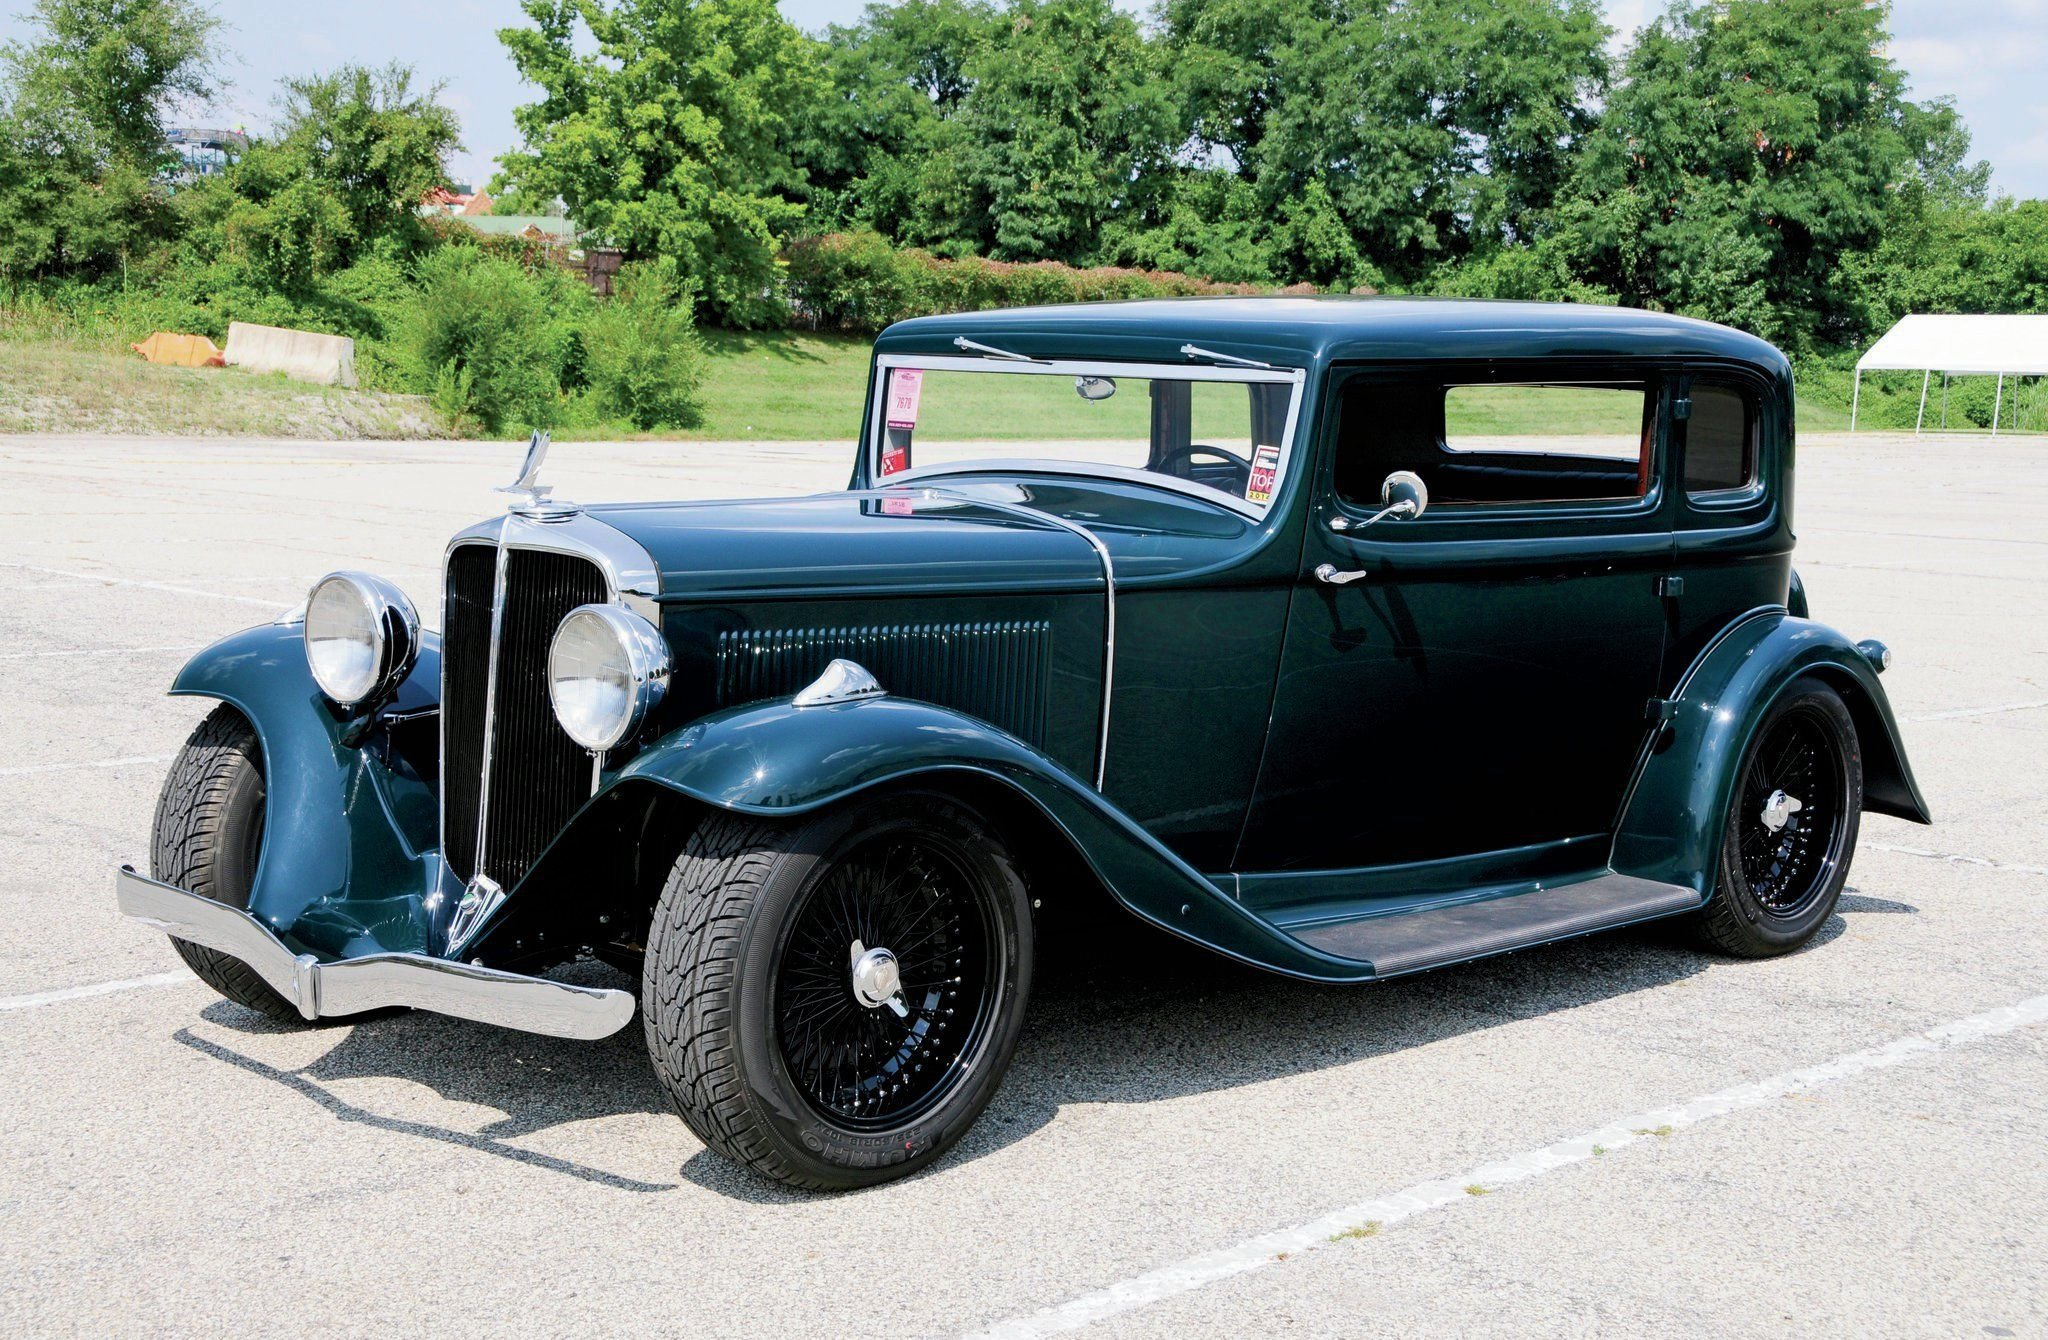 1932 Studebaker ST.Regis Brougham-01 wallpaper